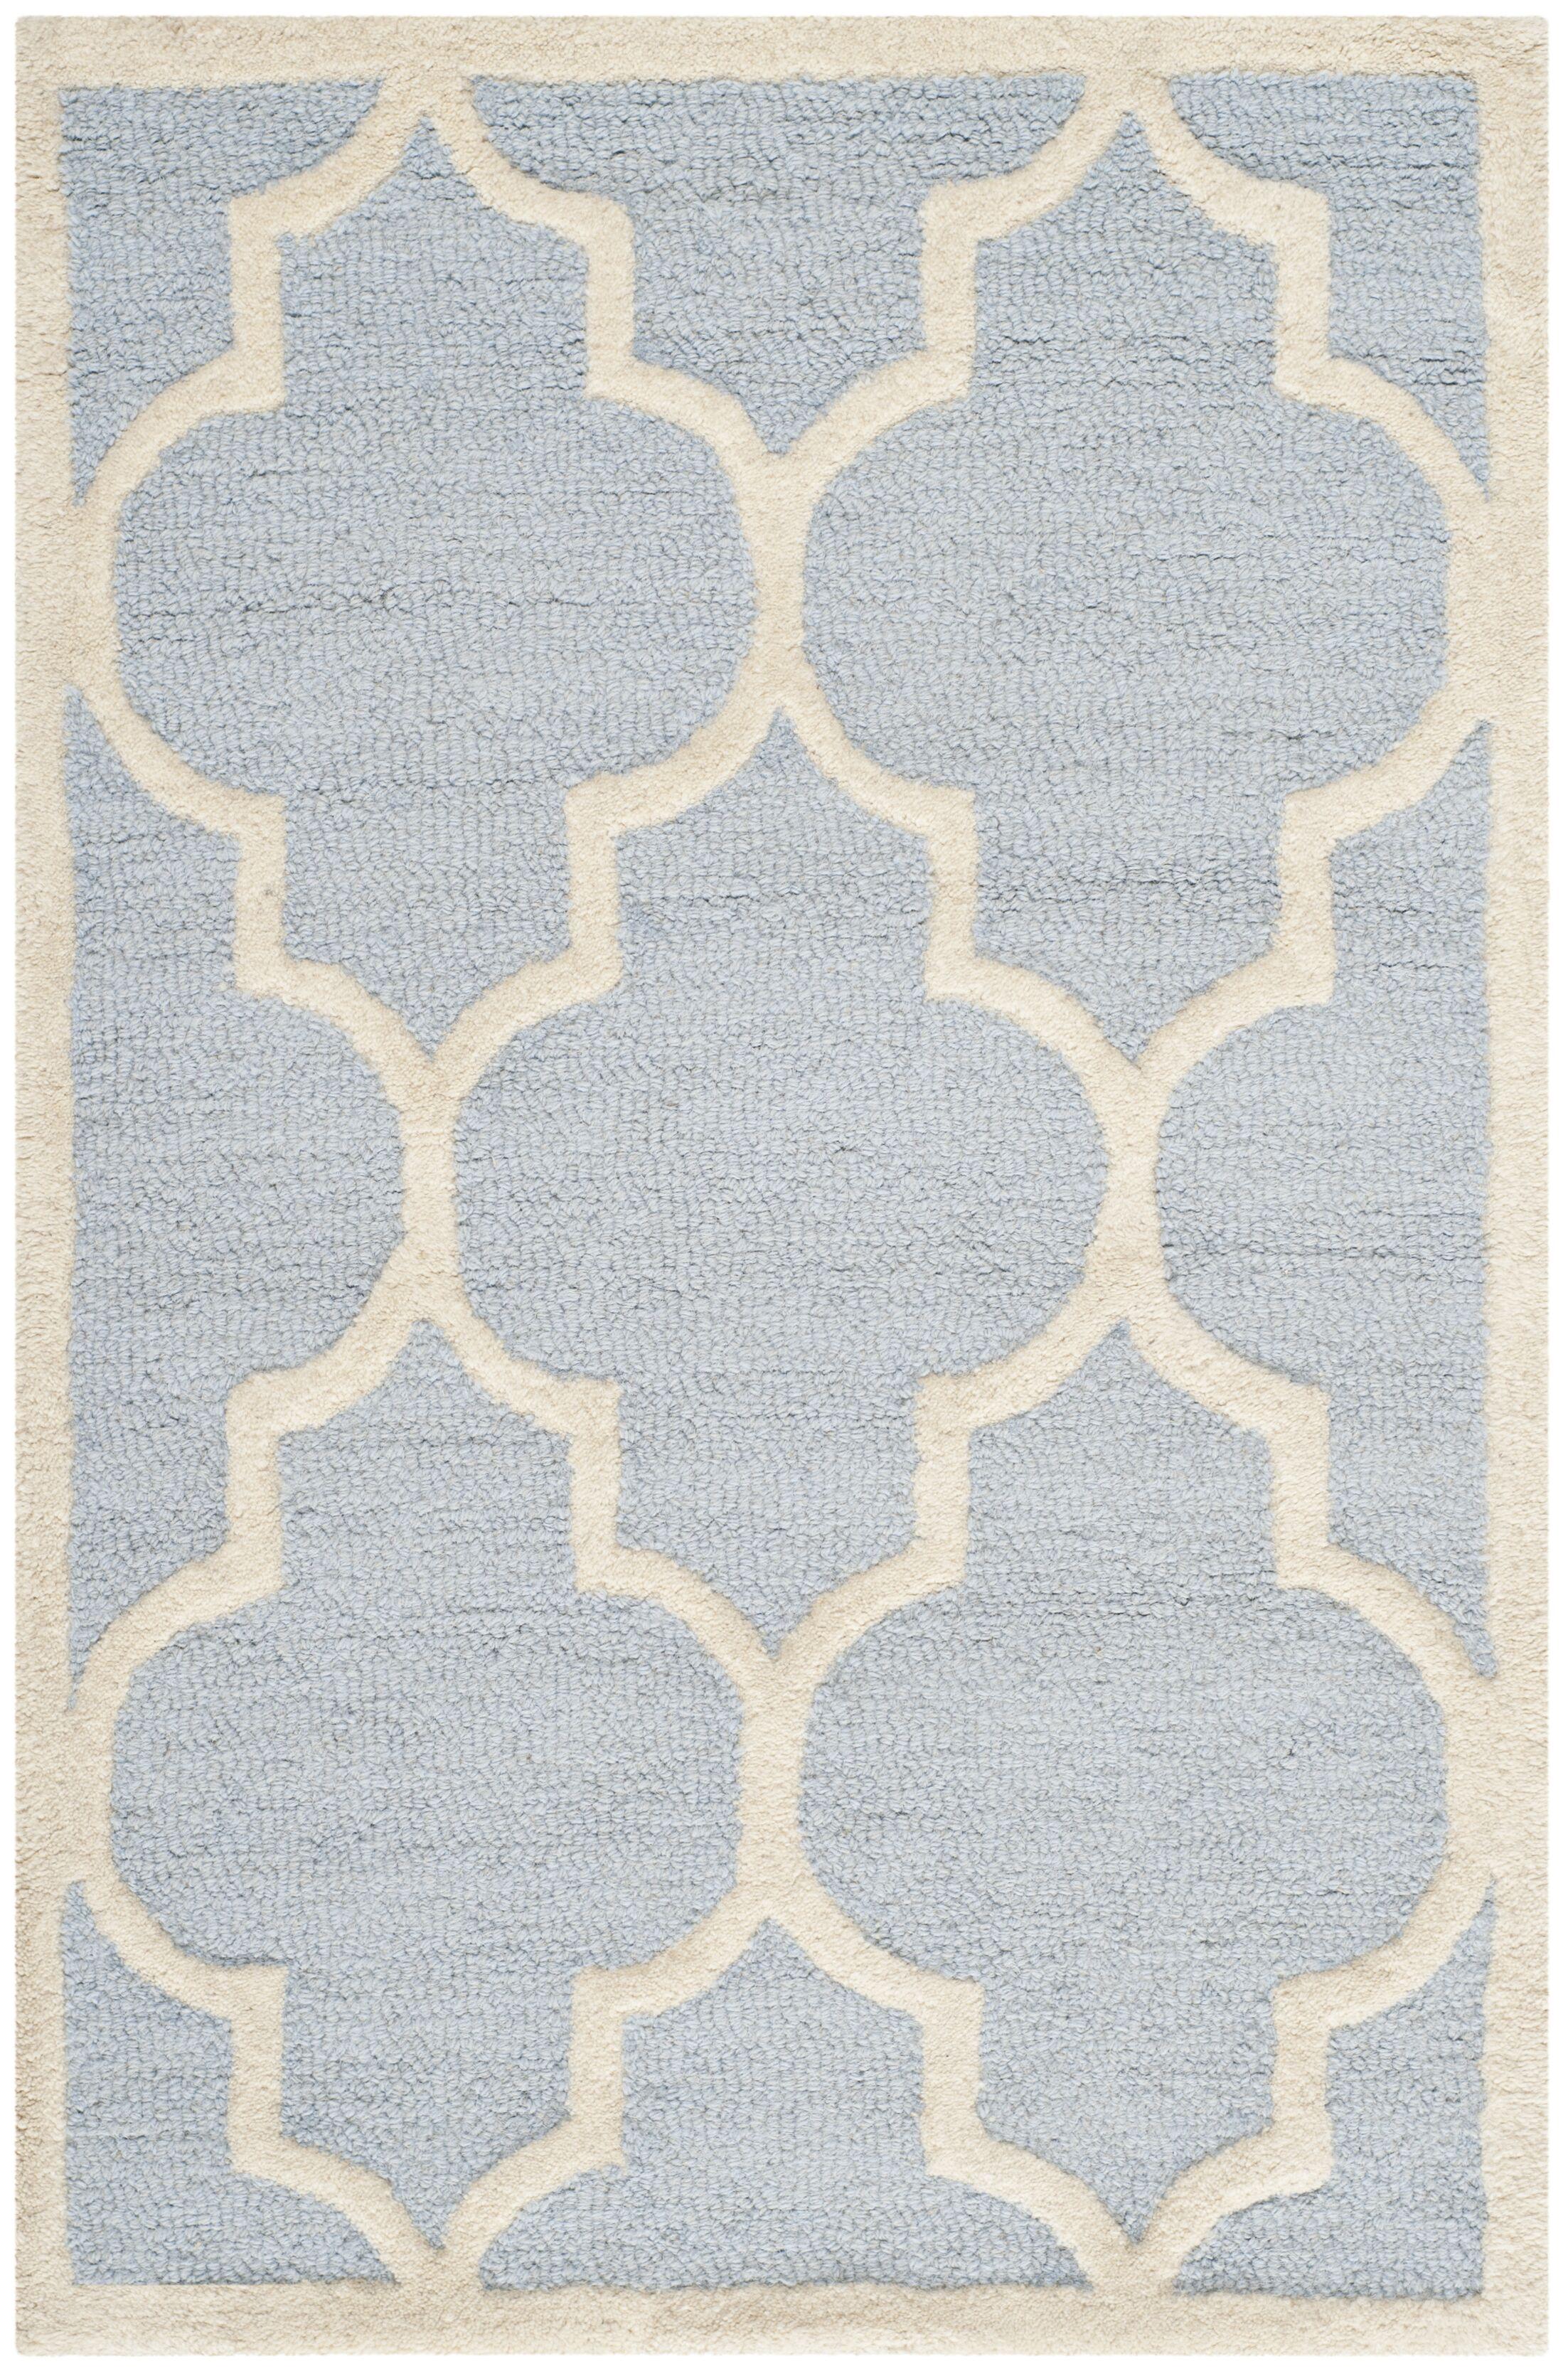 Charlenne Hand-Tufted Wool Light Blue/Ivory Area Rug Rug Size: Rectangle 11' x 15'